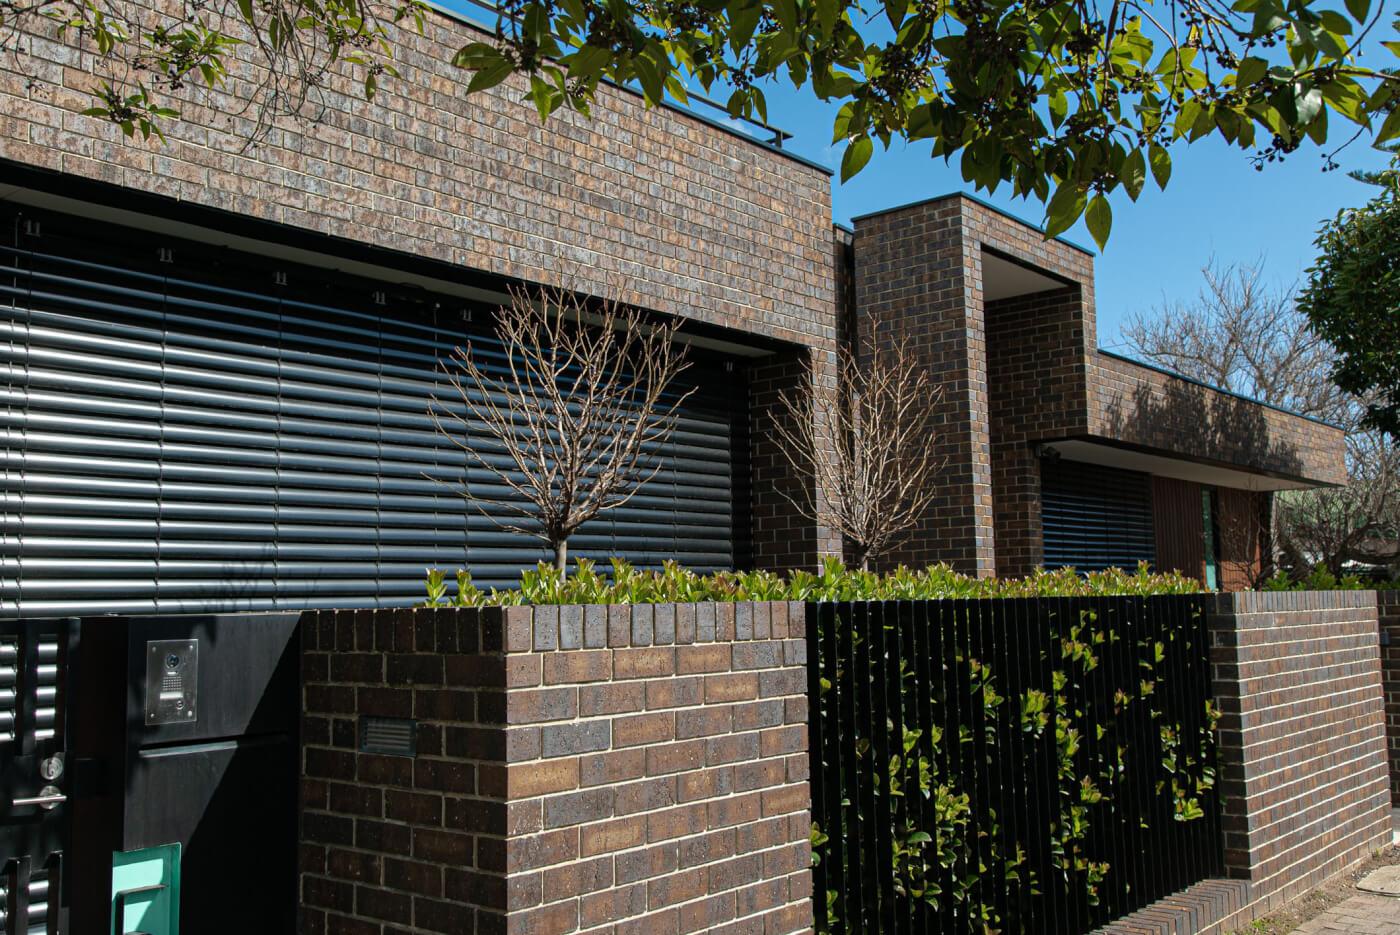 Coachhouse Brick 76mm Hyde Park Littlehampon Bricks And Pavers Reduced 11